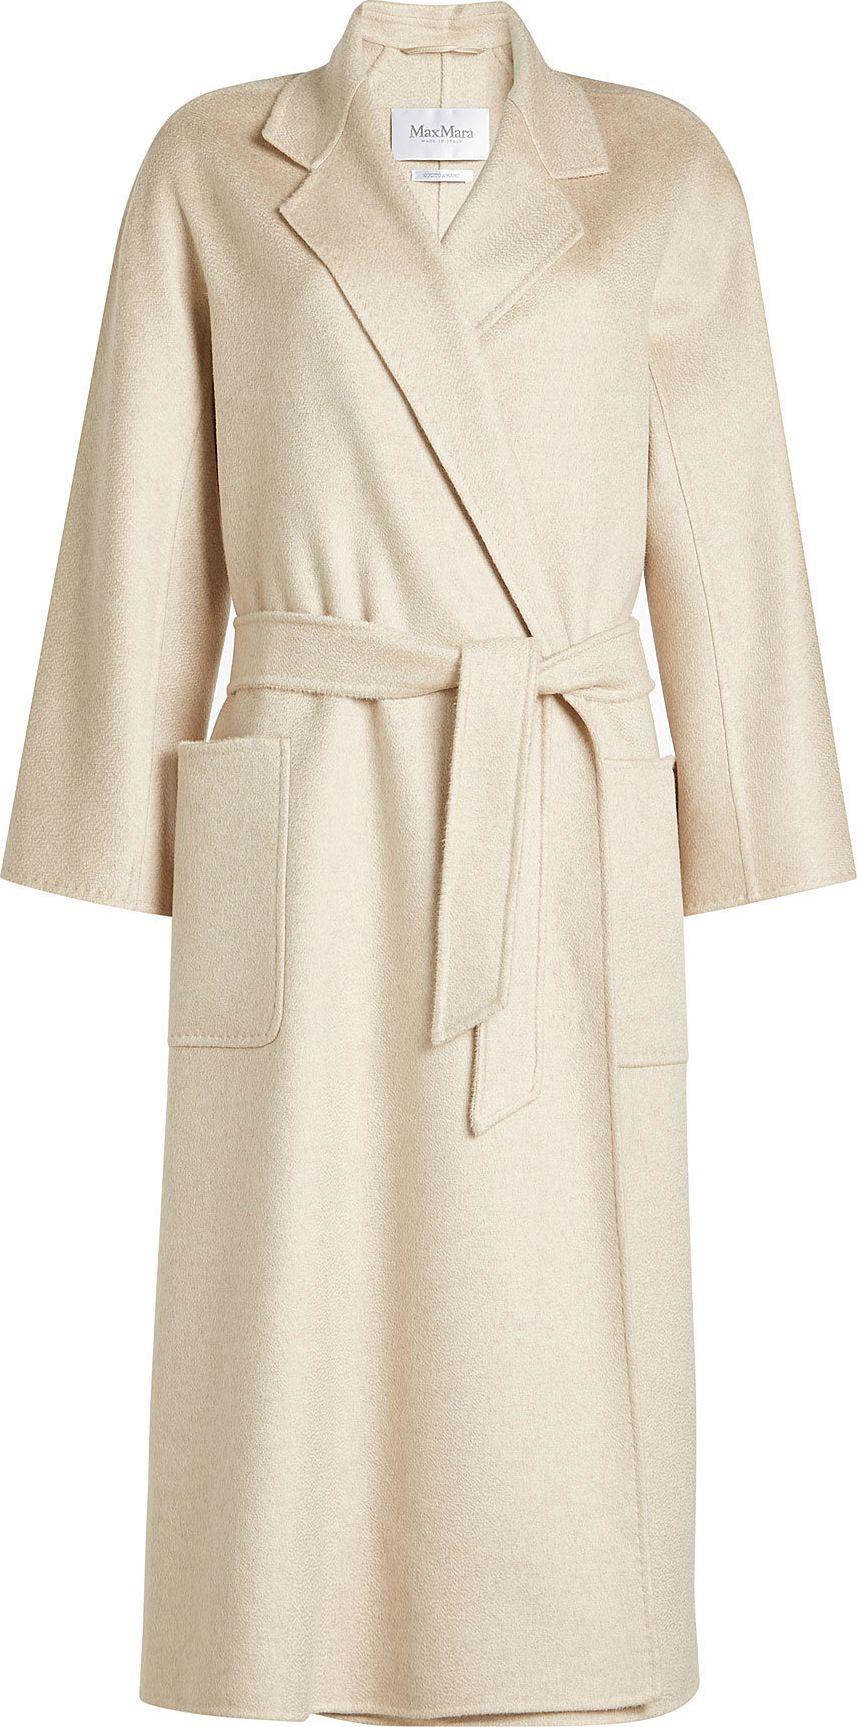 Max Mara - Belted Wool Coat